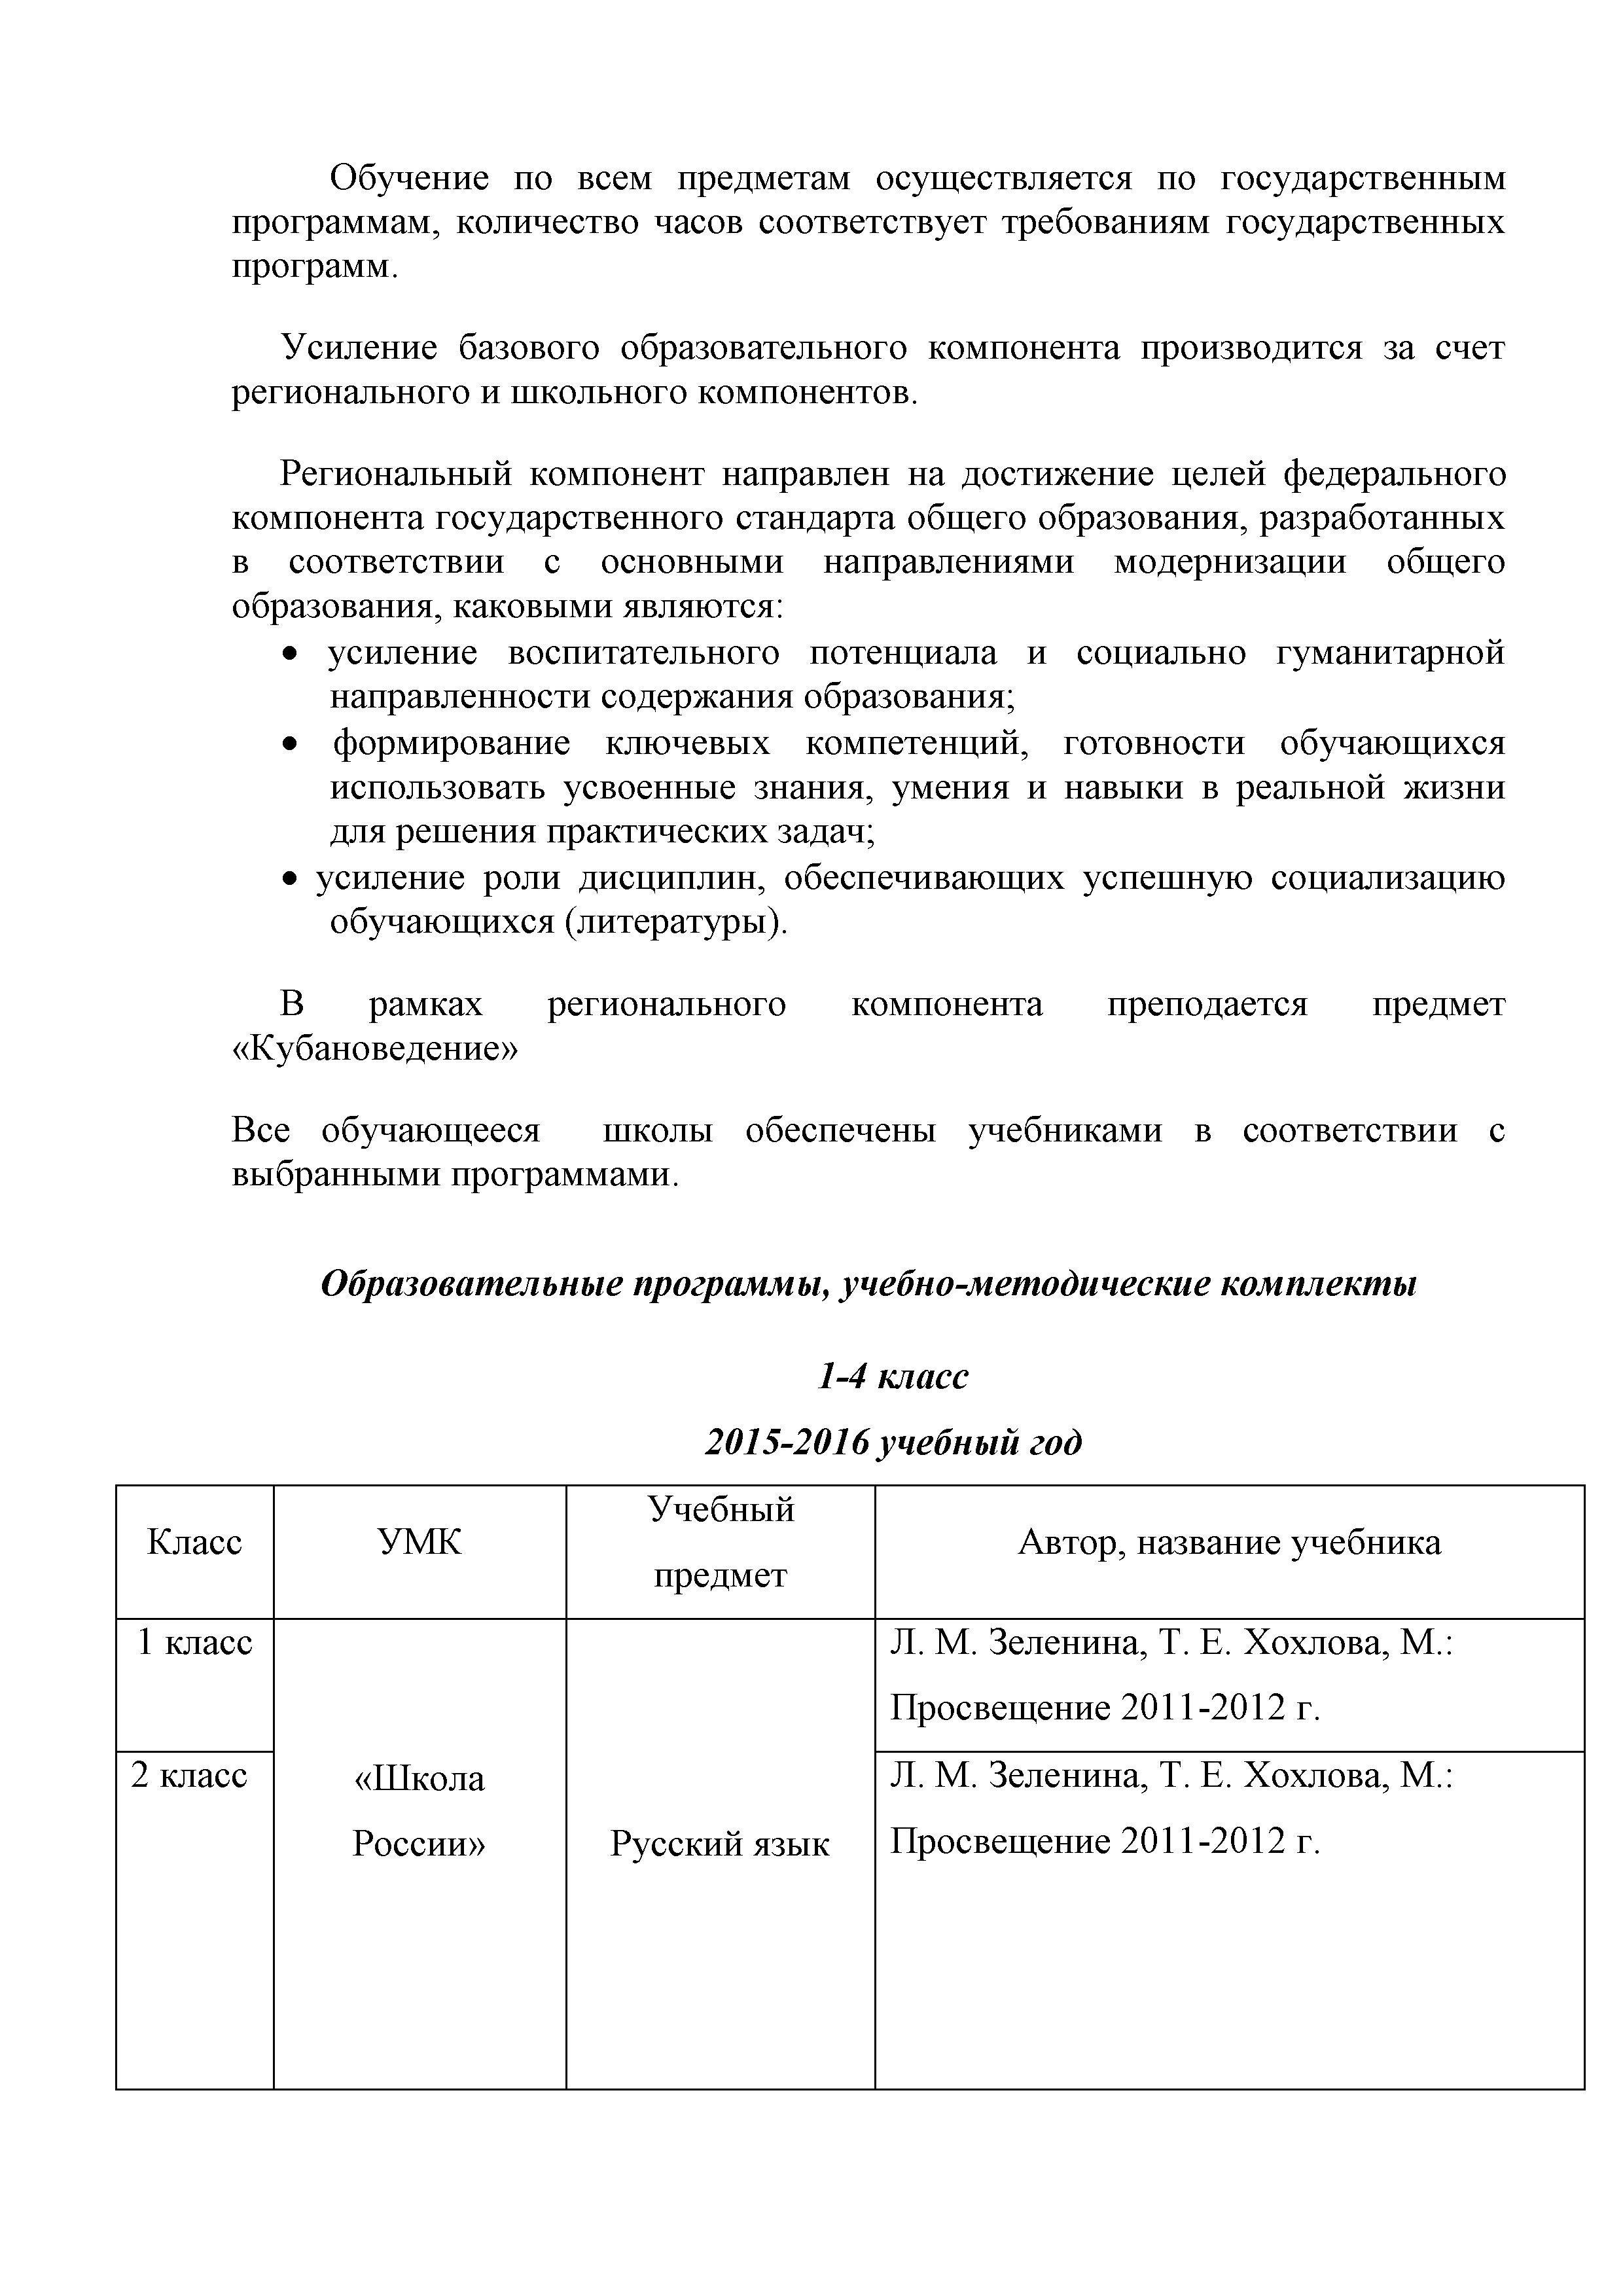 кубановедение 2 класс еременко зыгина шевченко